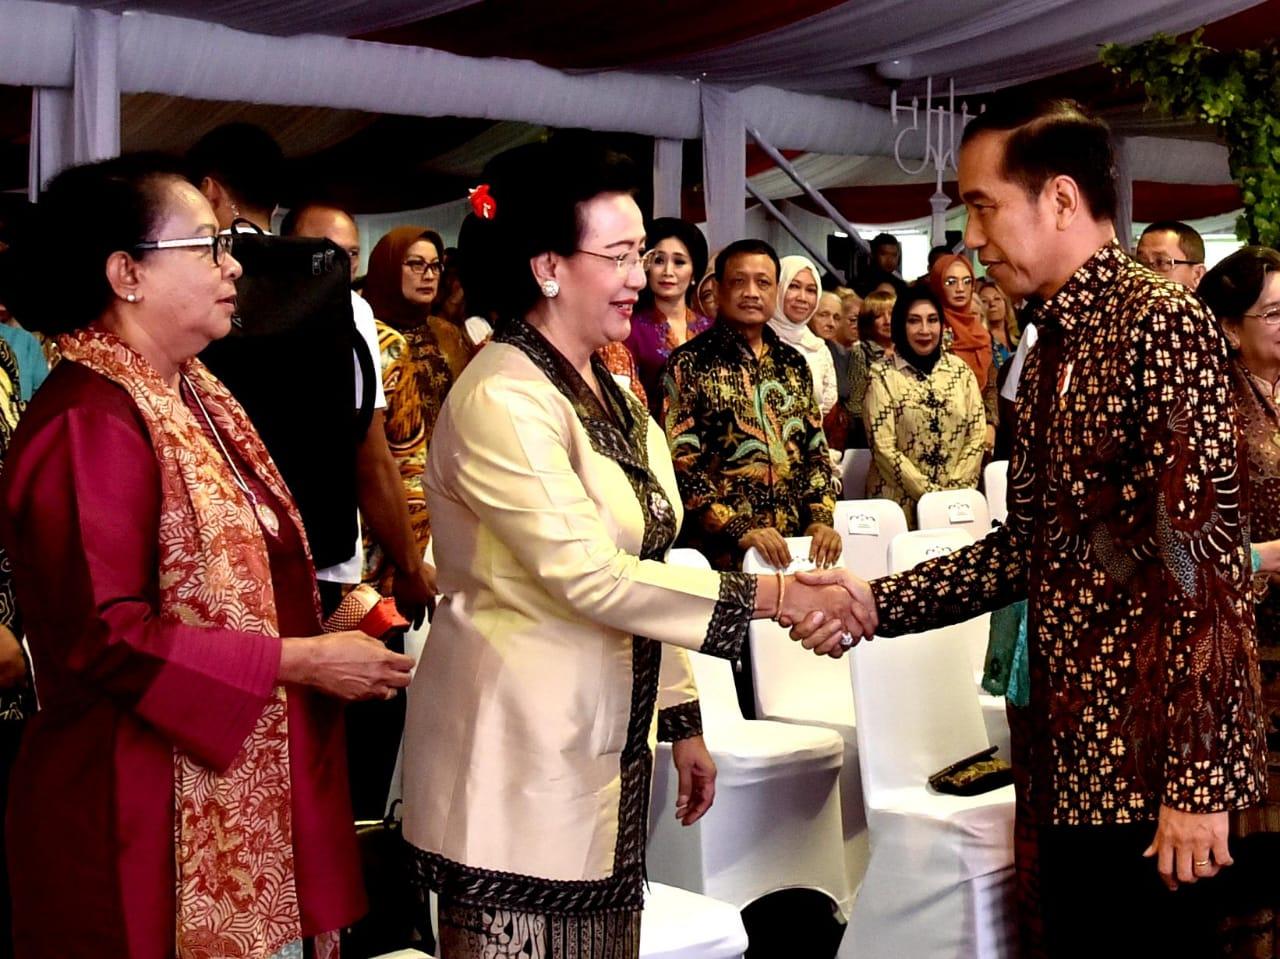 presiden-jokowi-jadilah-ibu-bangsa-wahai-perempuan-indonesia-7